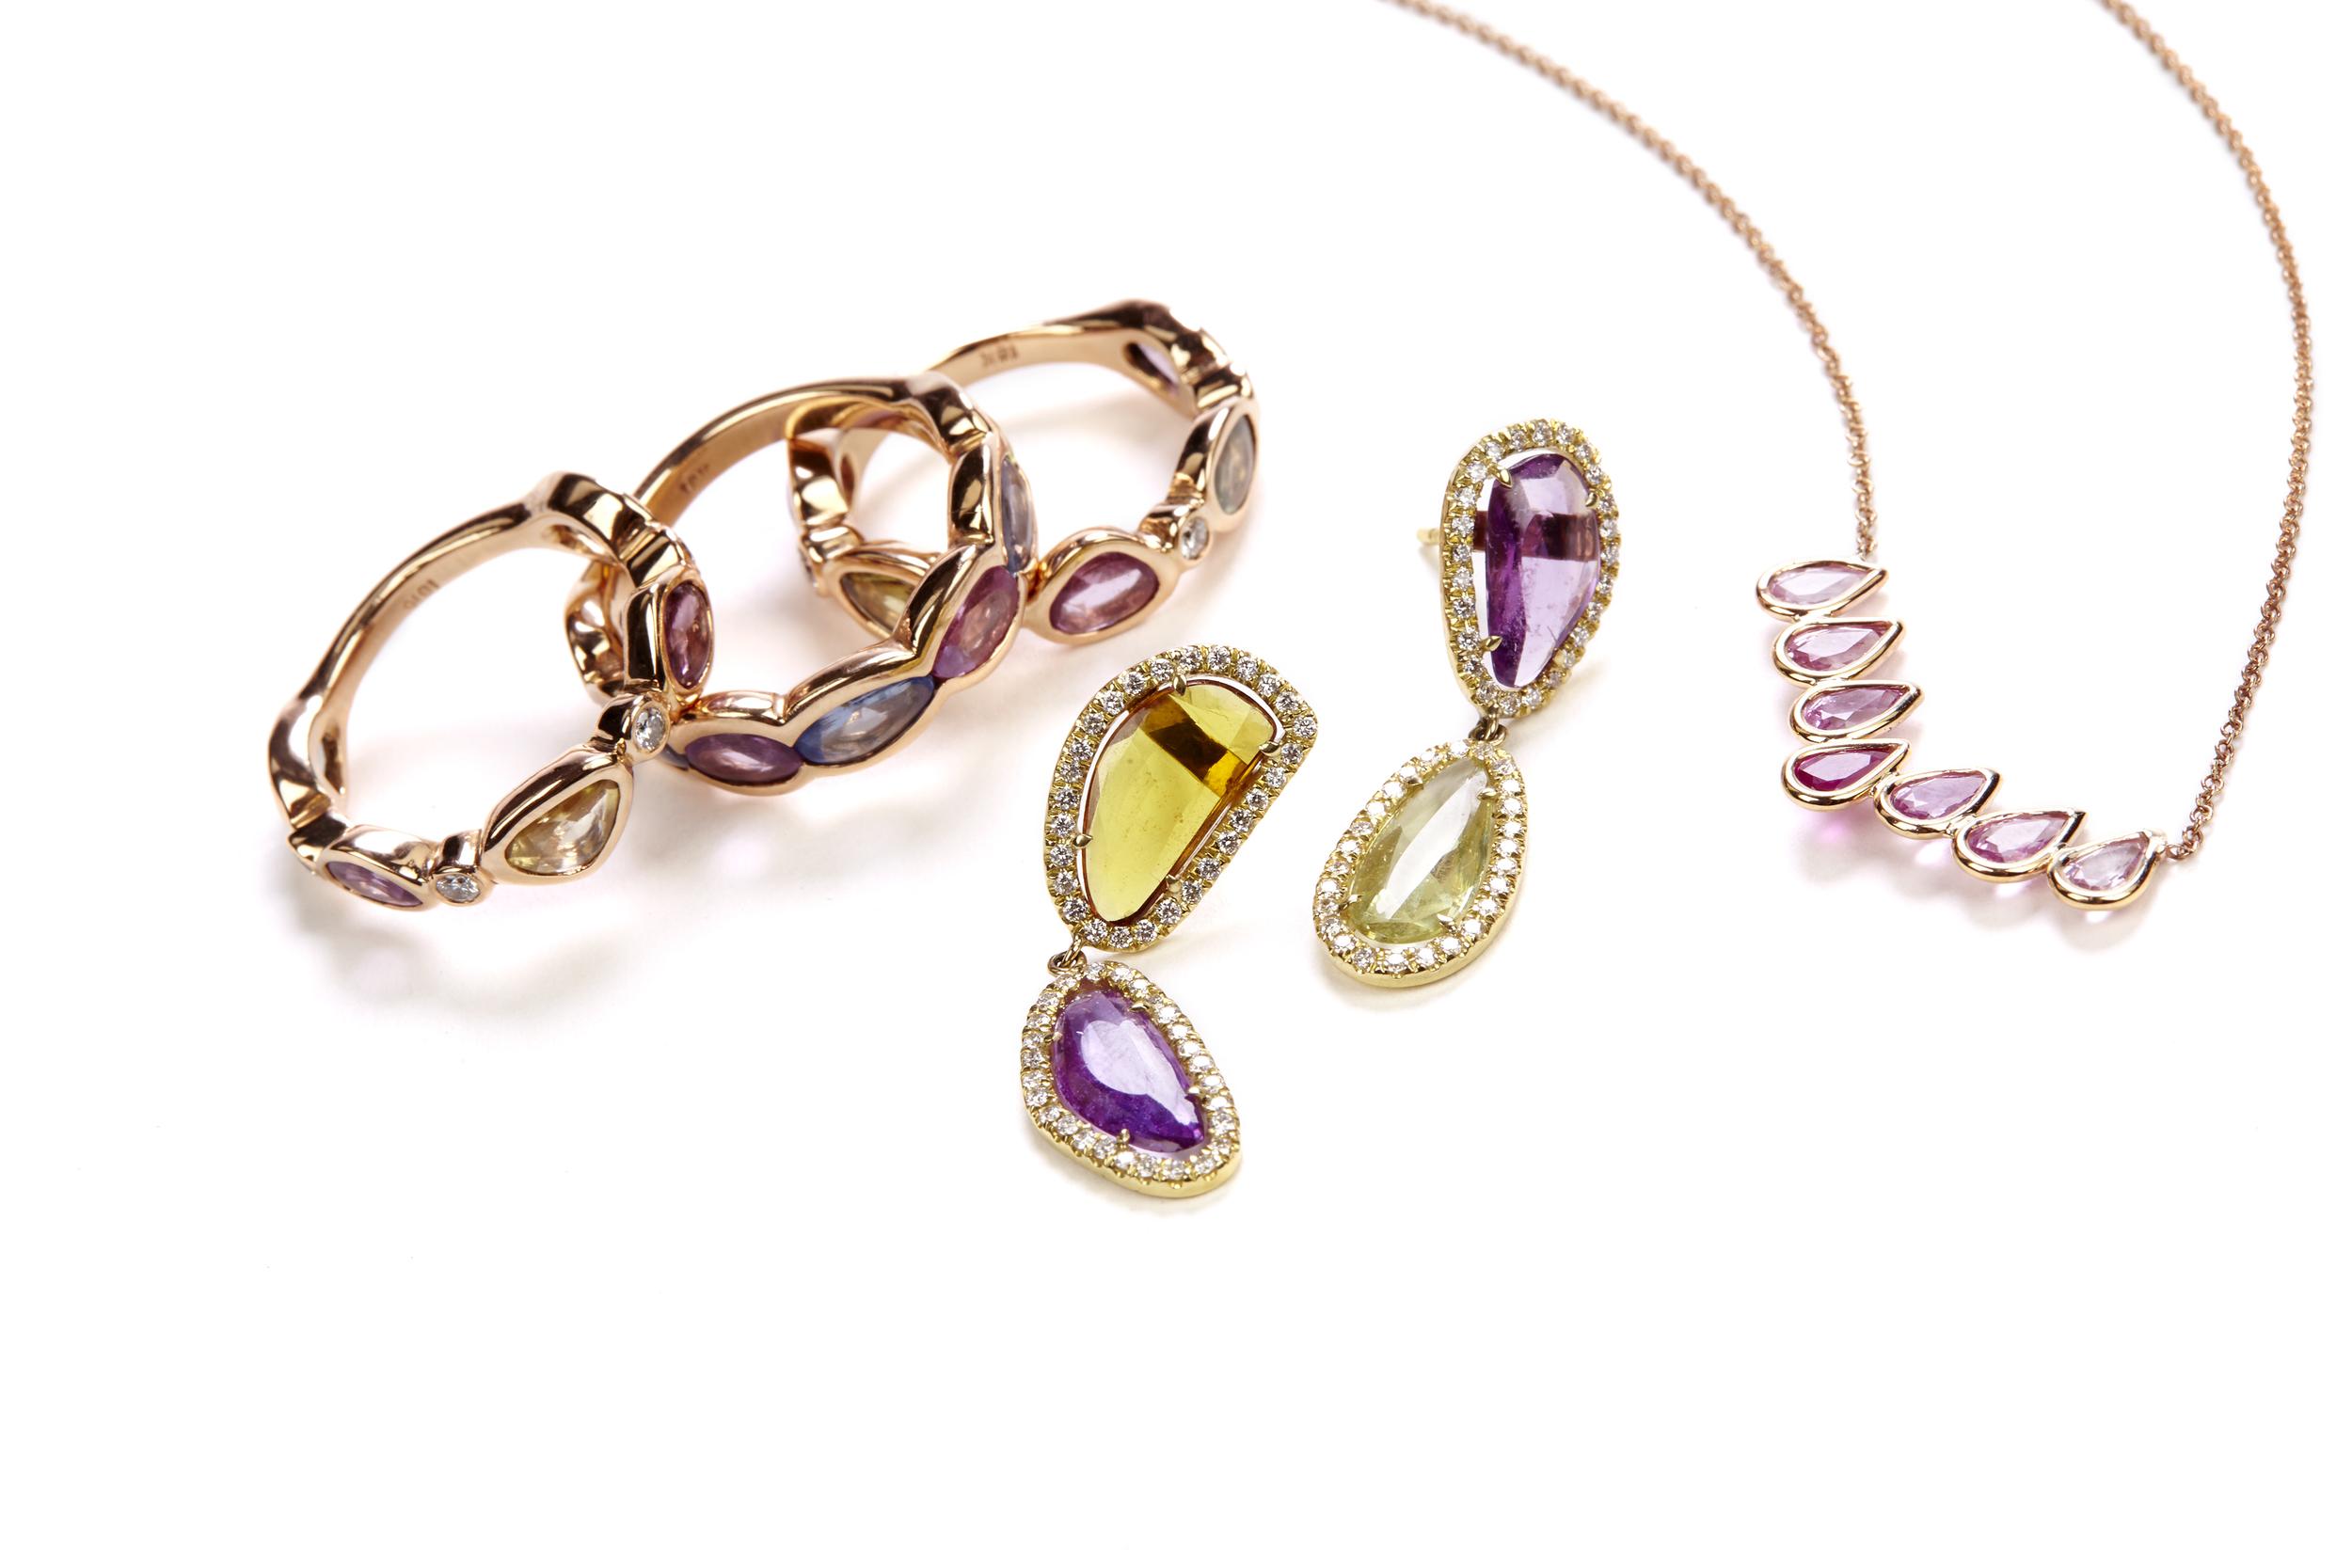 Rose Cut Ring, Rose cut earrings, Pink Pear Necklace.jpg